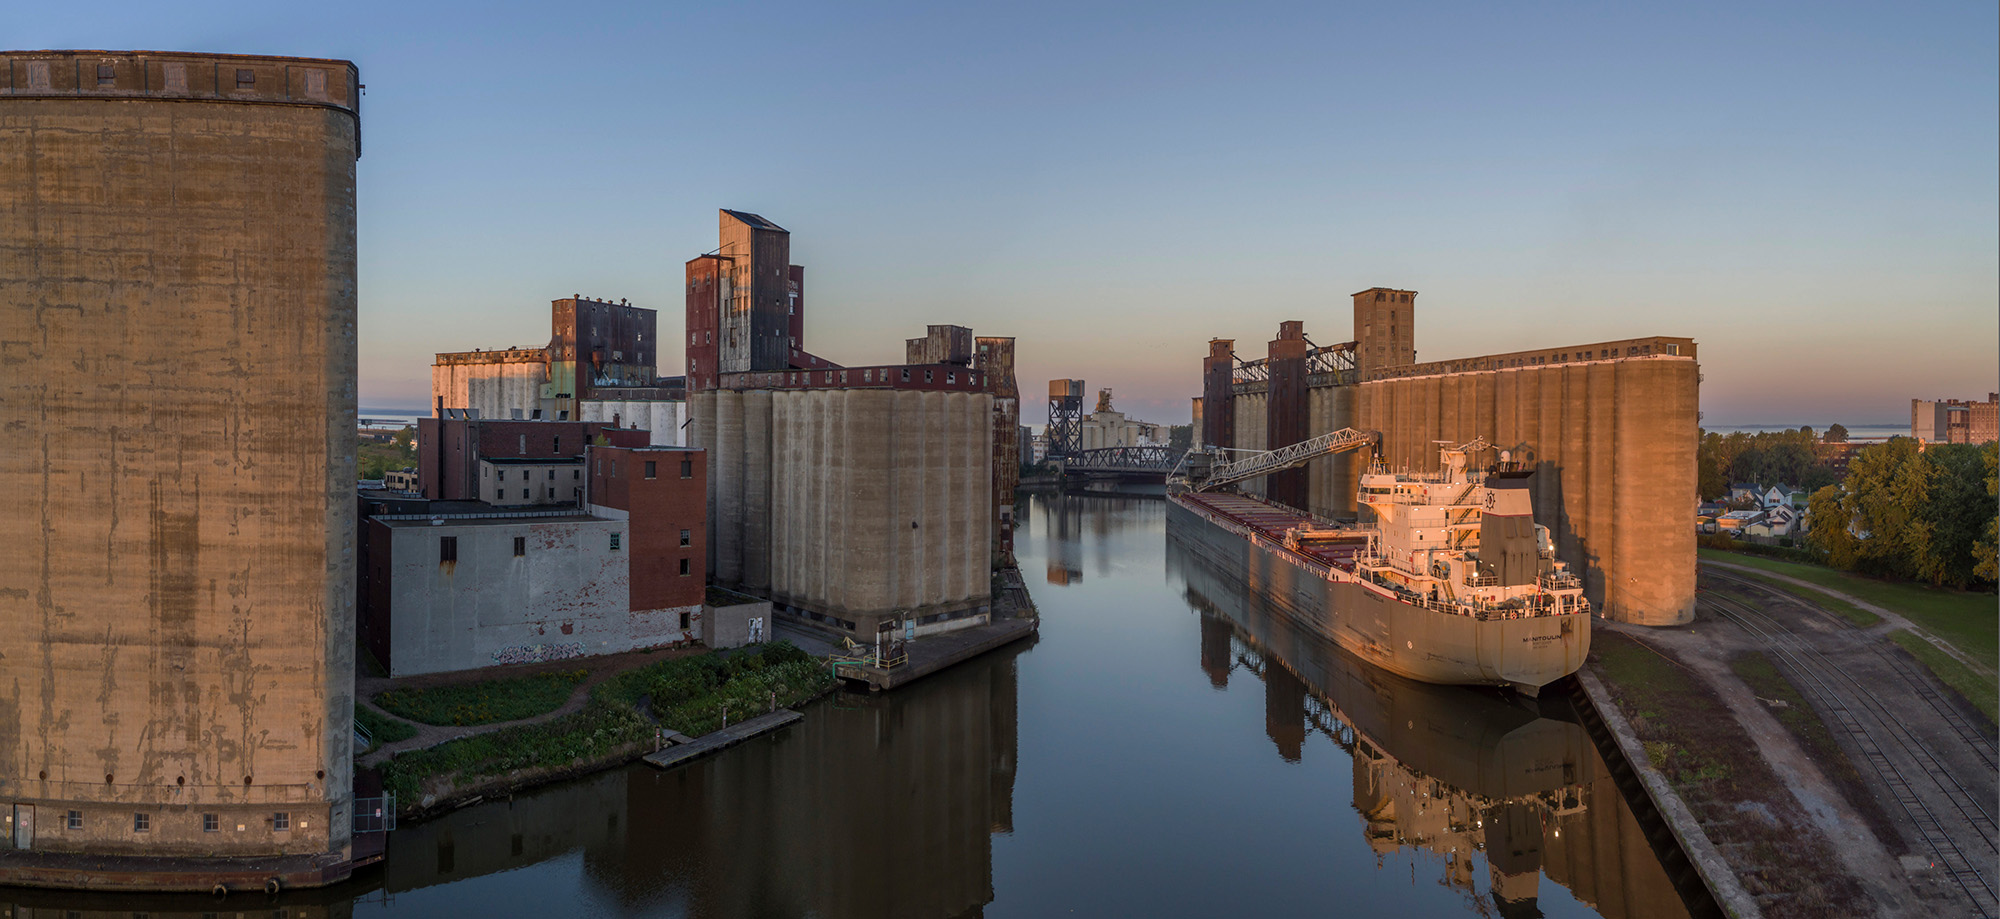 011_Peter_Essick-Buffalo_River_New_York.jpg